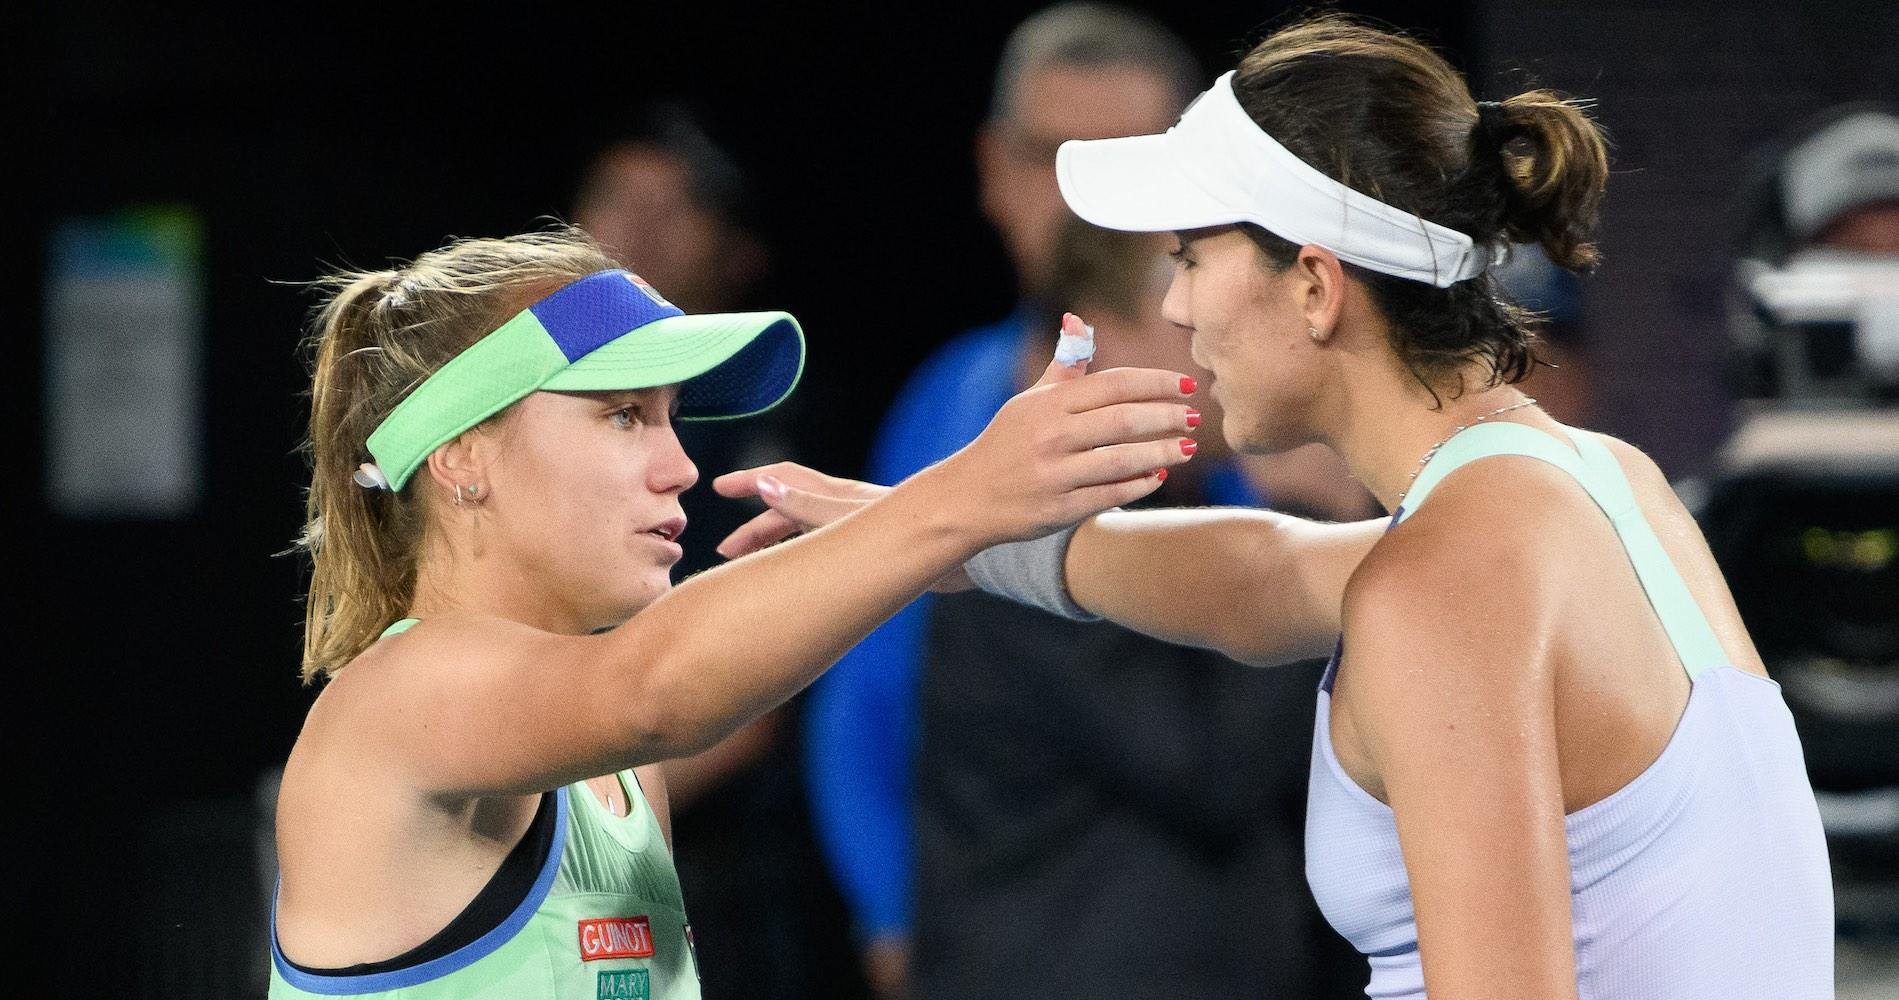 Australian Open final, 2020, Kenin and Muguruza